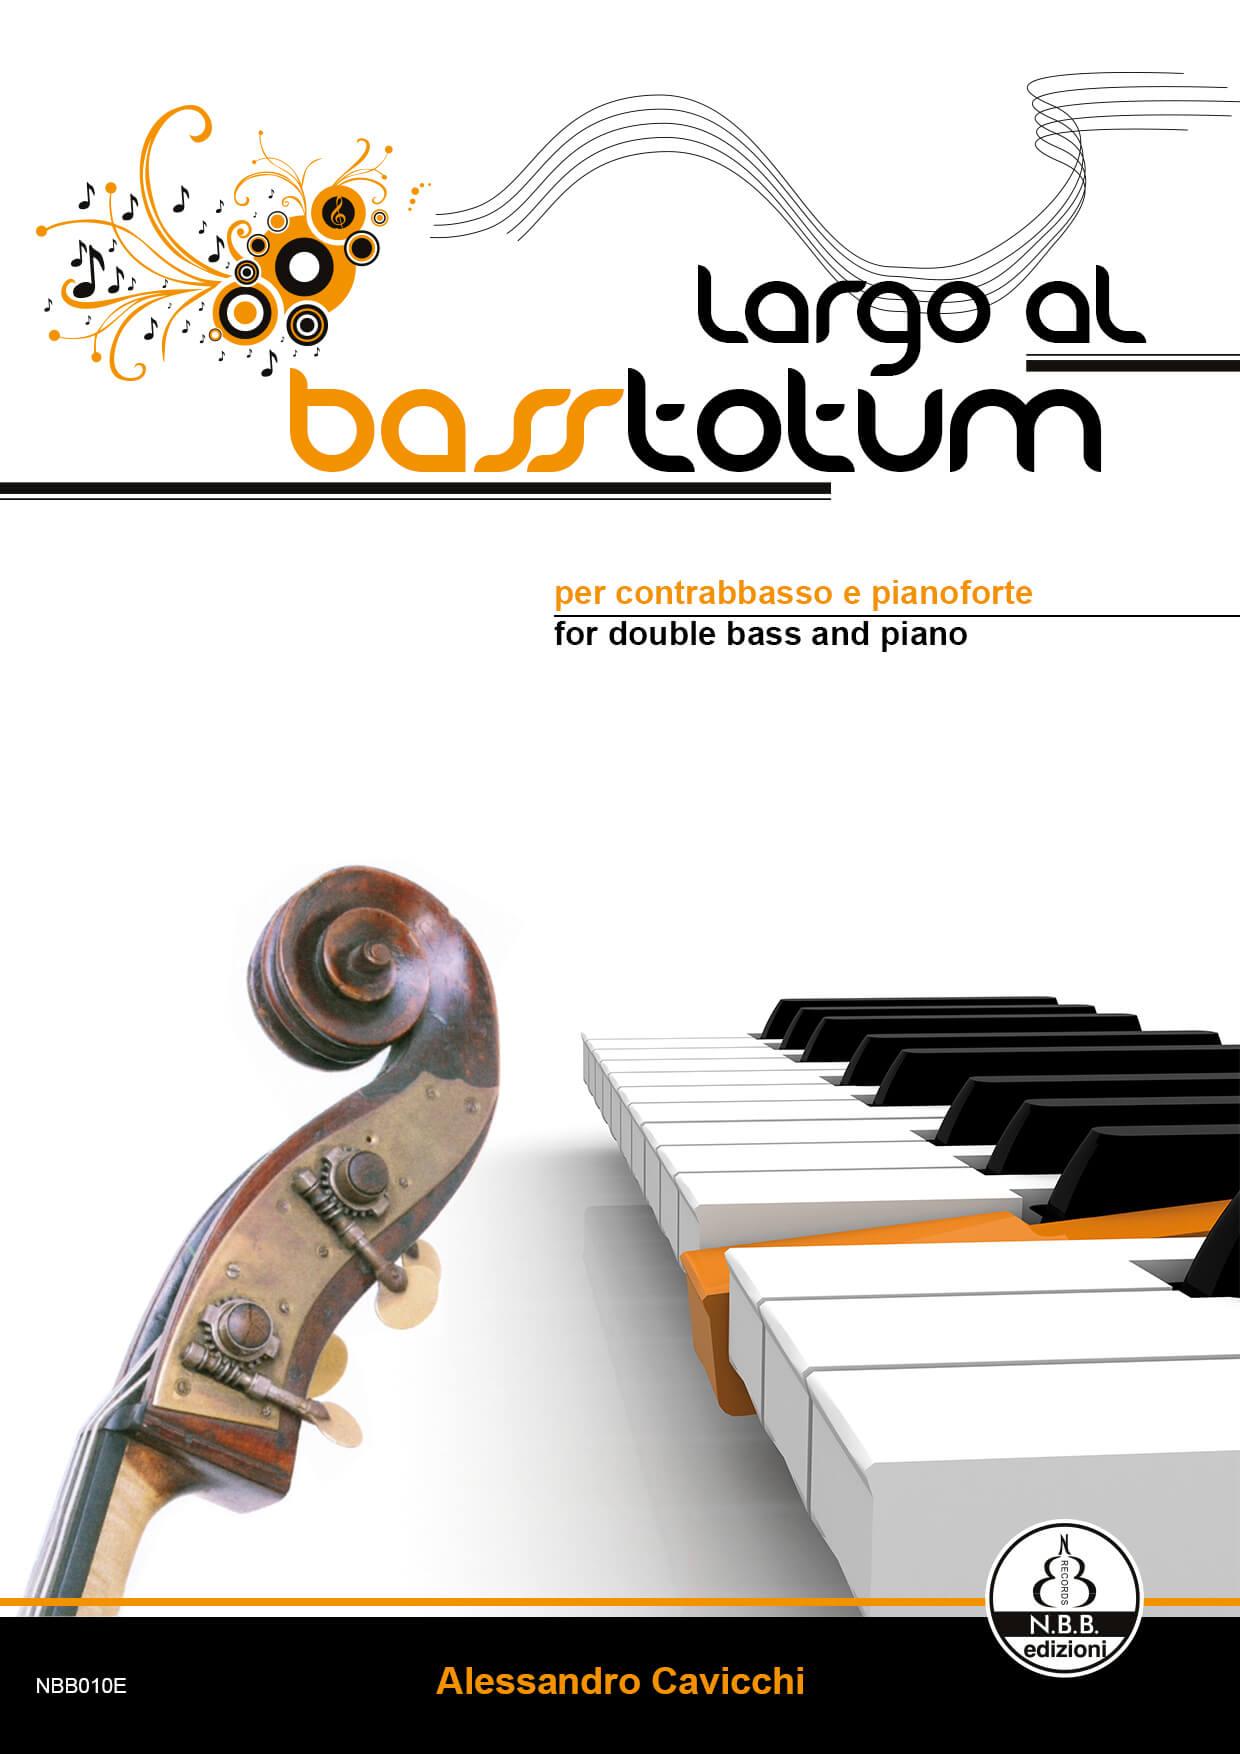 nbbrecords-basstotum-front